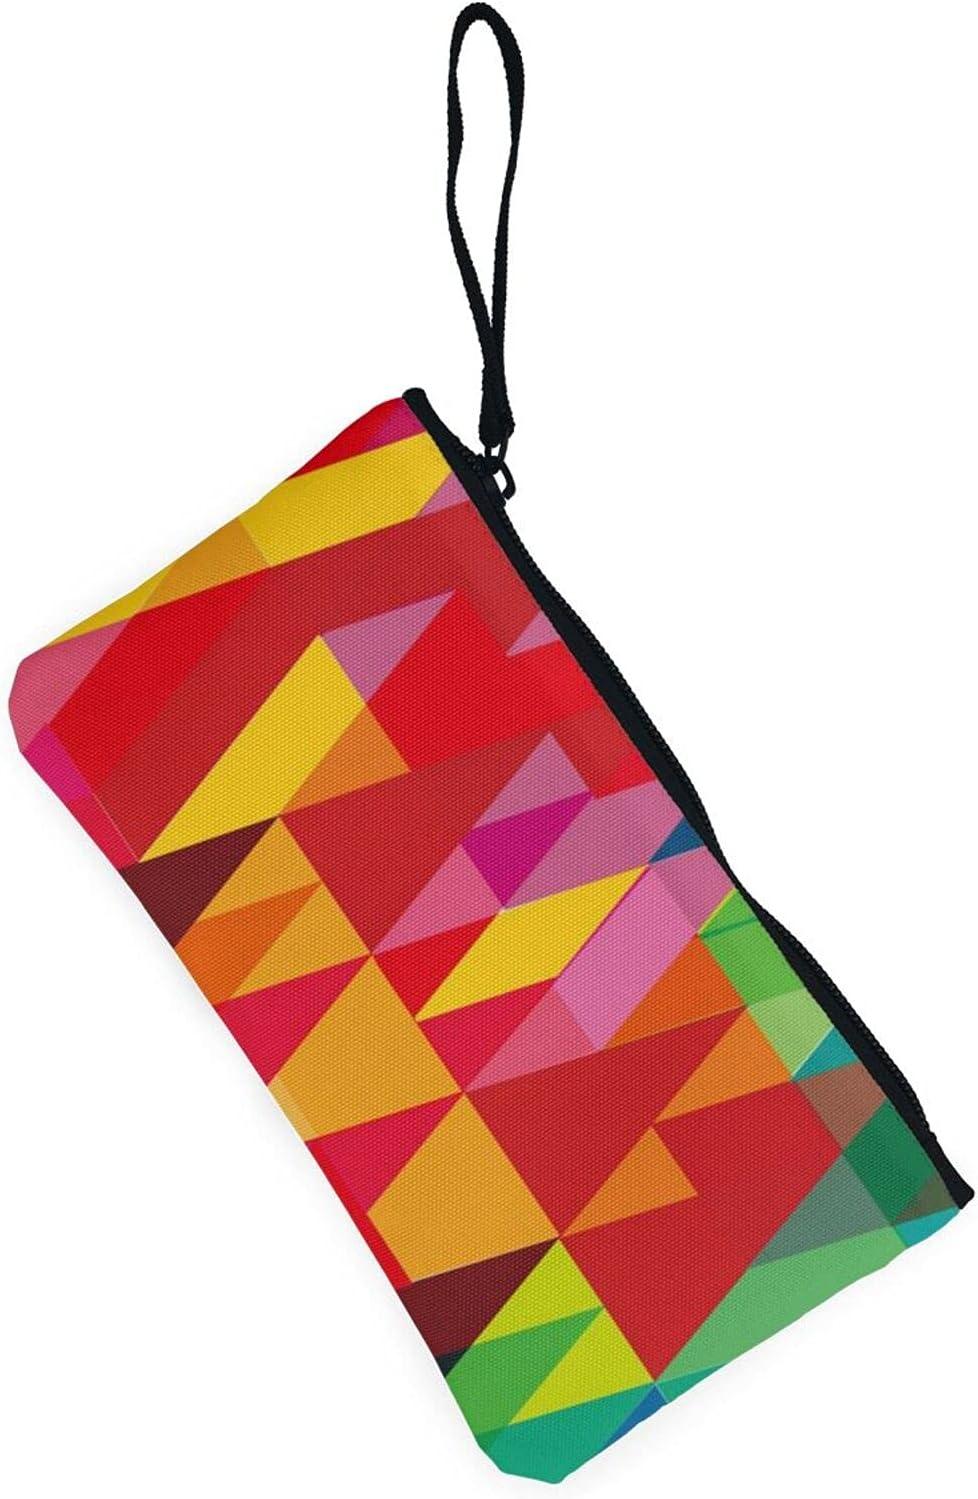 AORRUAM Triangular colorful geometric Canvas Coin Purse,Canvas Zipper Pencil Cases,Canvas Change Purse Pouch Mini Wallet Coin Bag